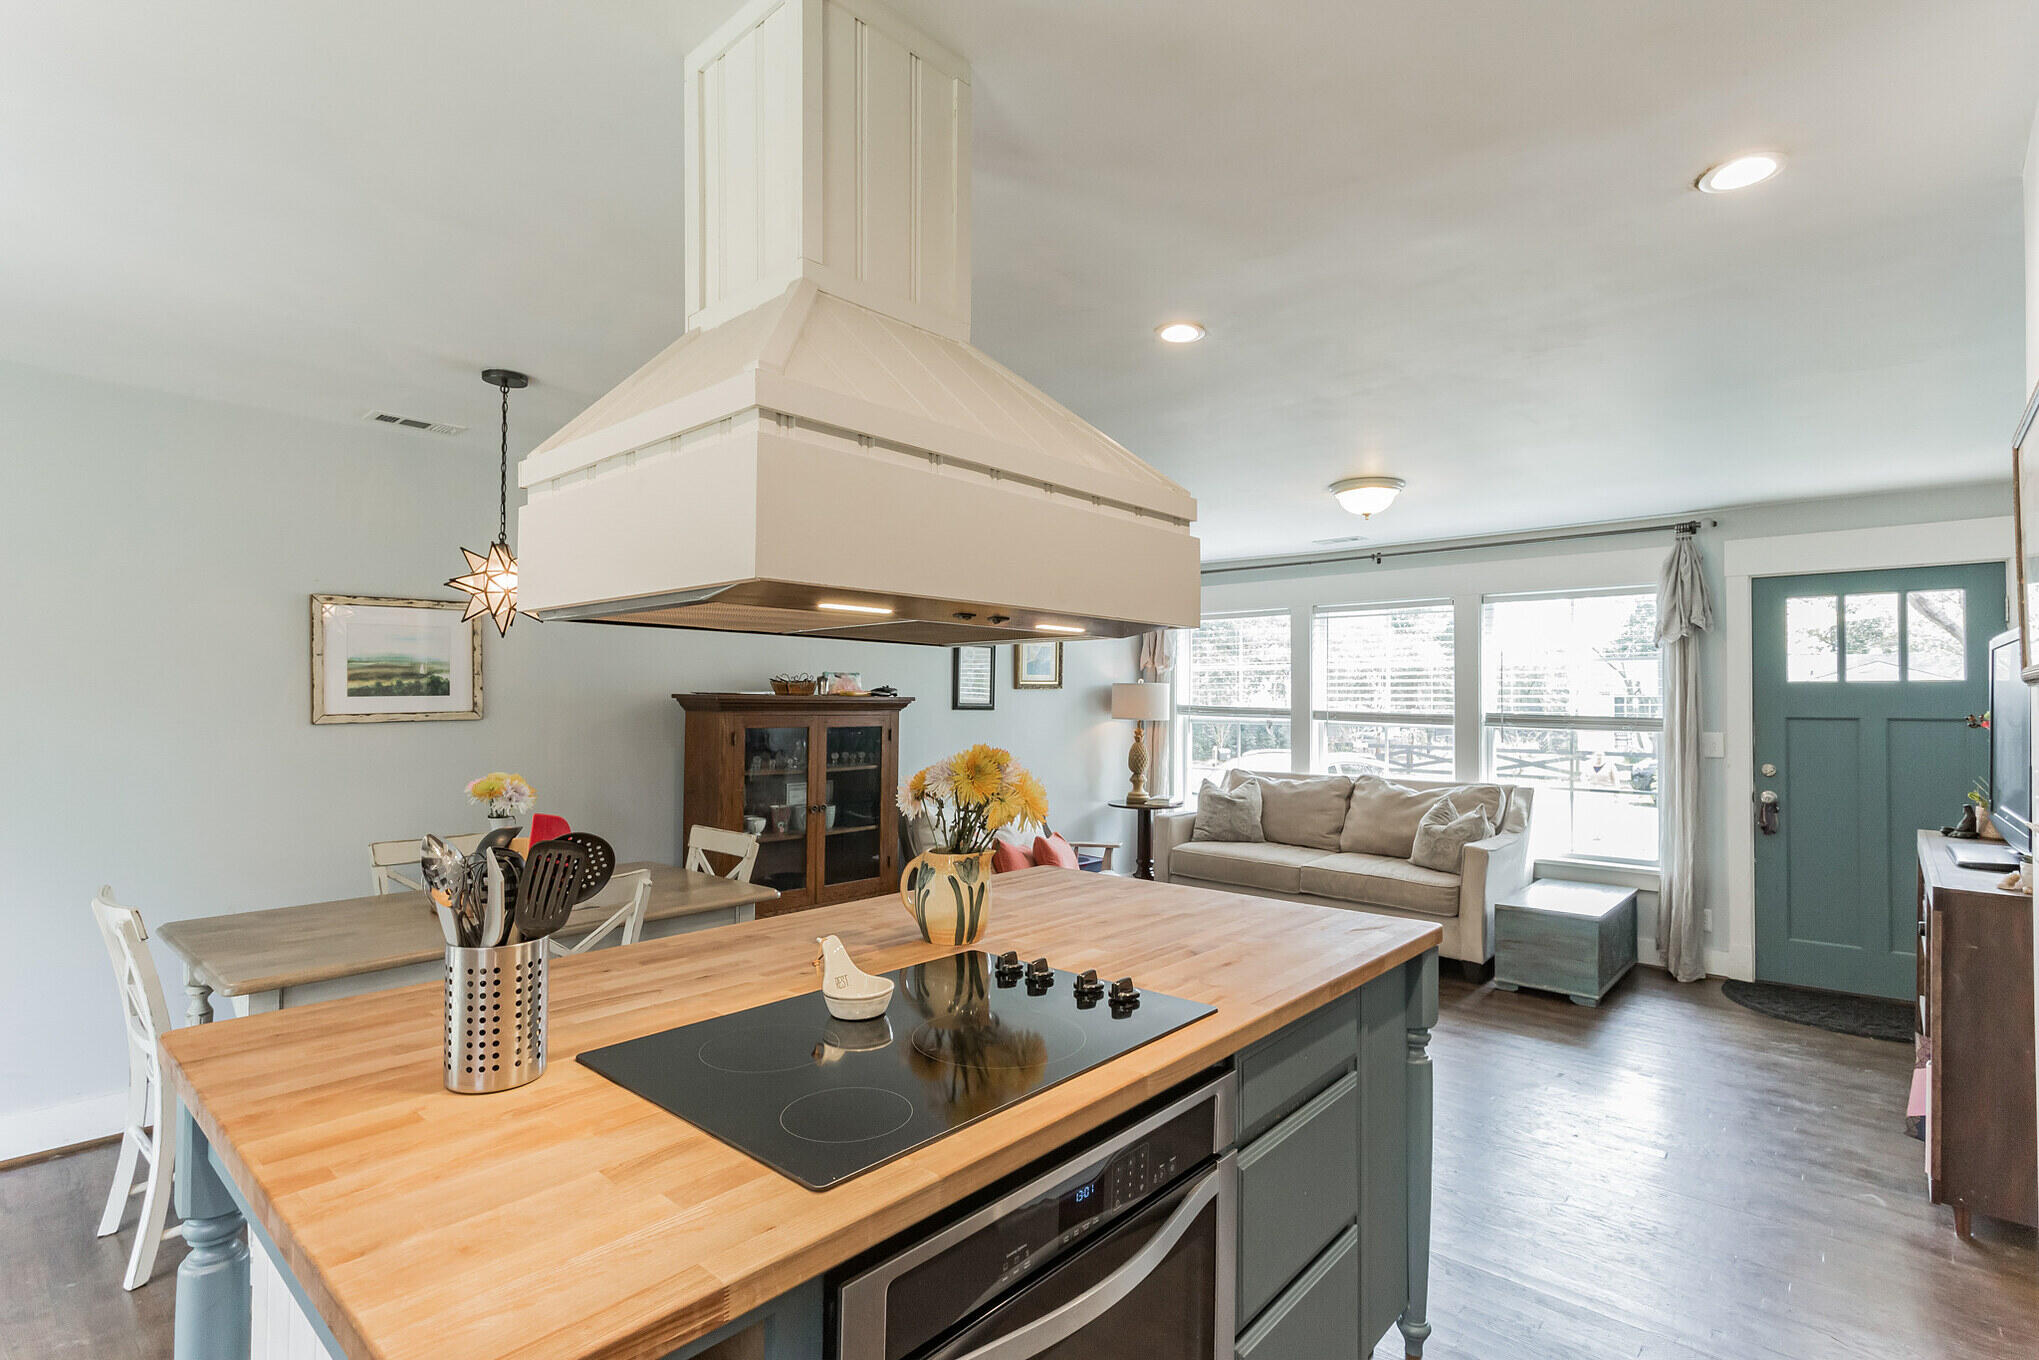 Stafford Heights Homes For Sale - 3472 Cynthia, Johns Island, SC - 6